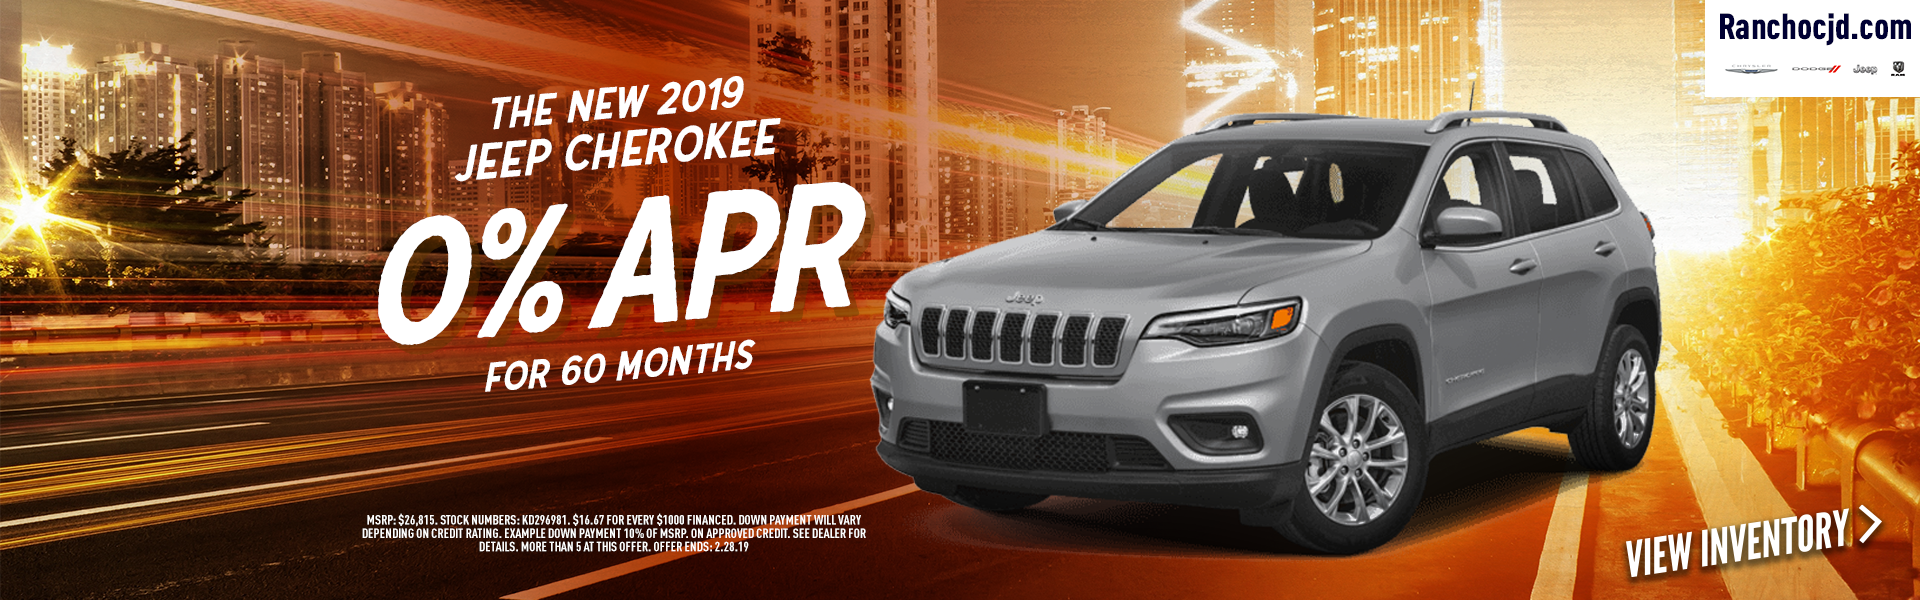 san-diego-ca-2019-jeep-cherokee